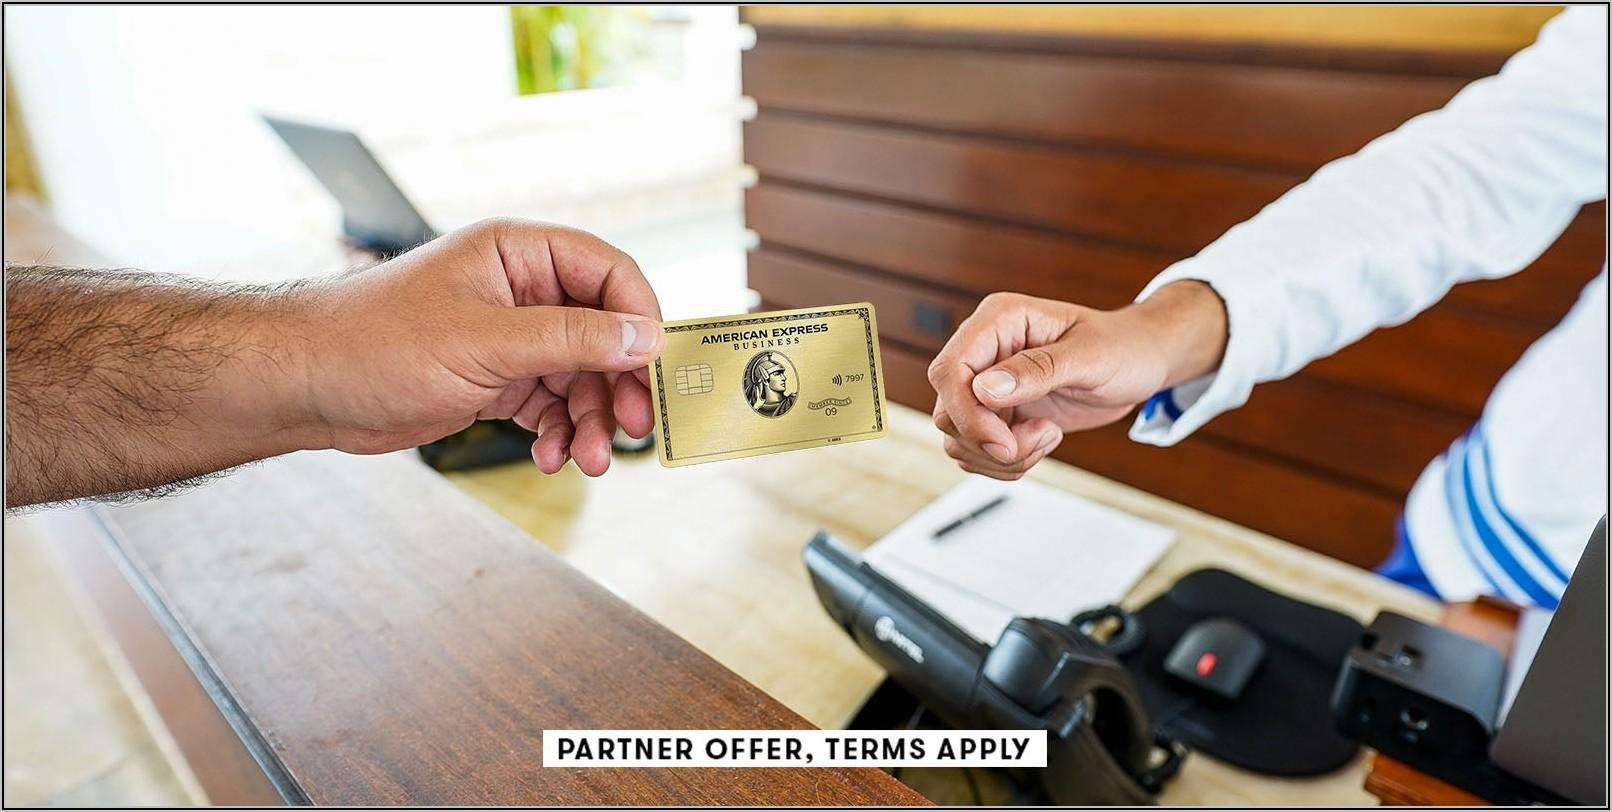 American Express Business Gold Rewards Card Benefits